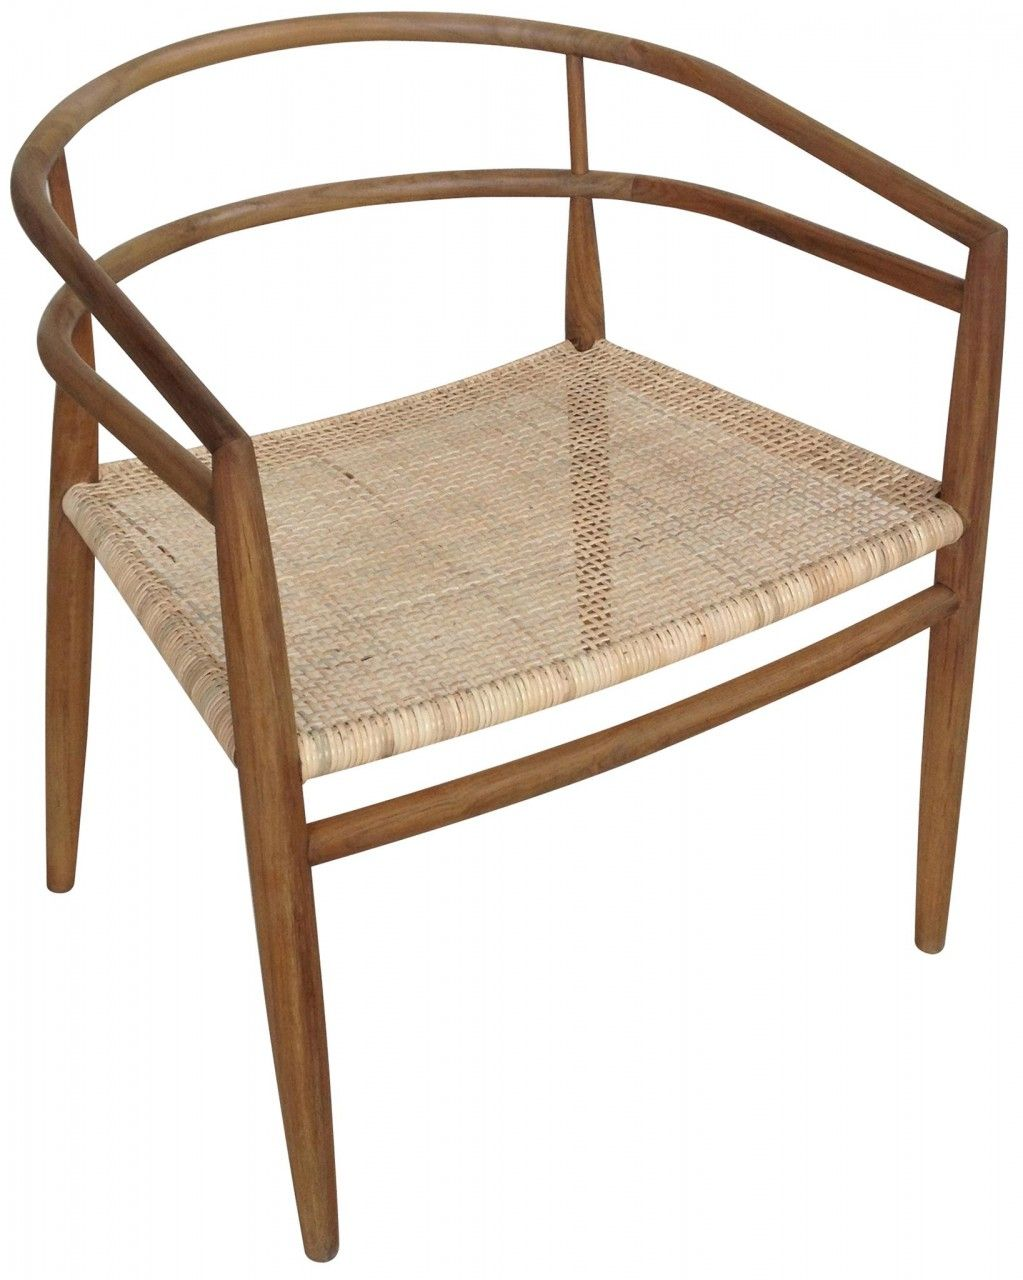 Finley Chair - $684 via Dovecote Decor